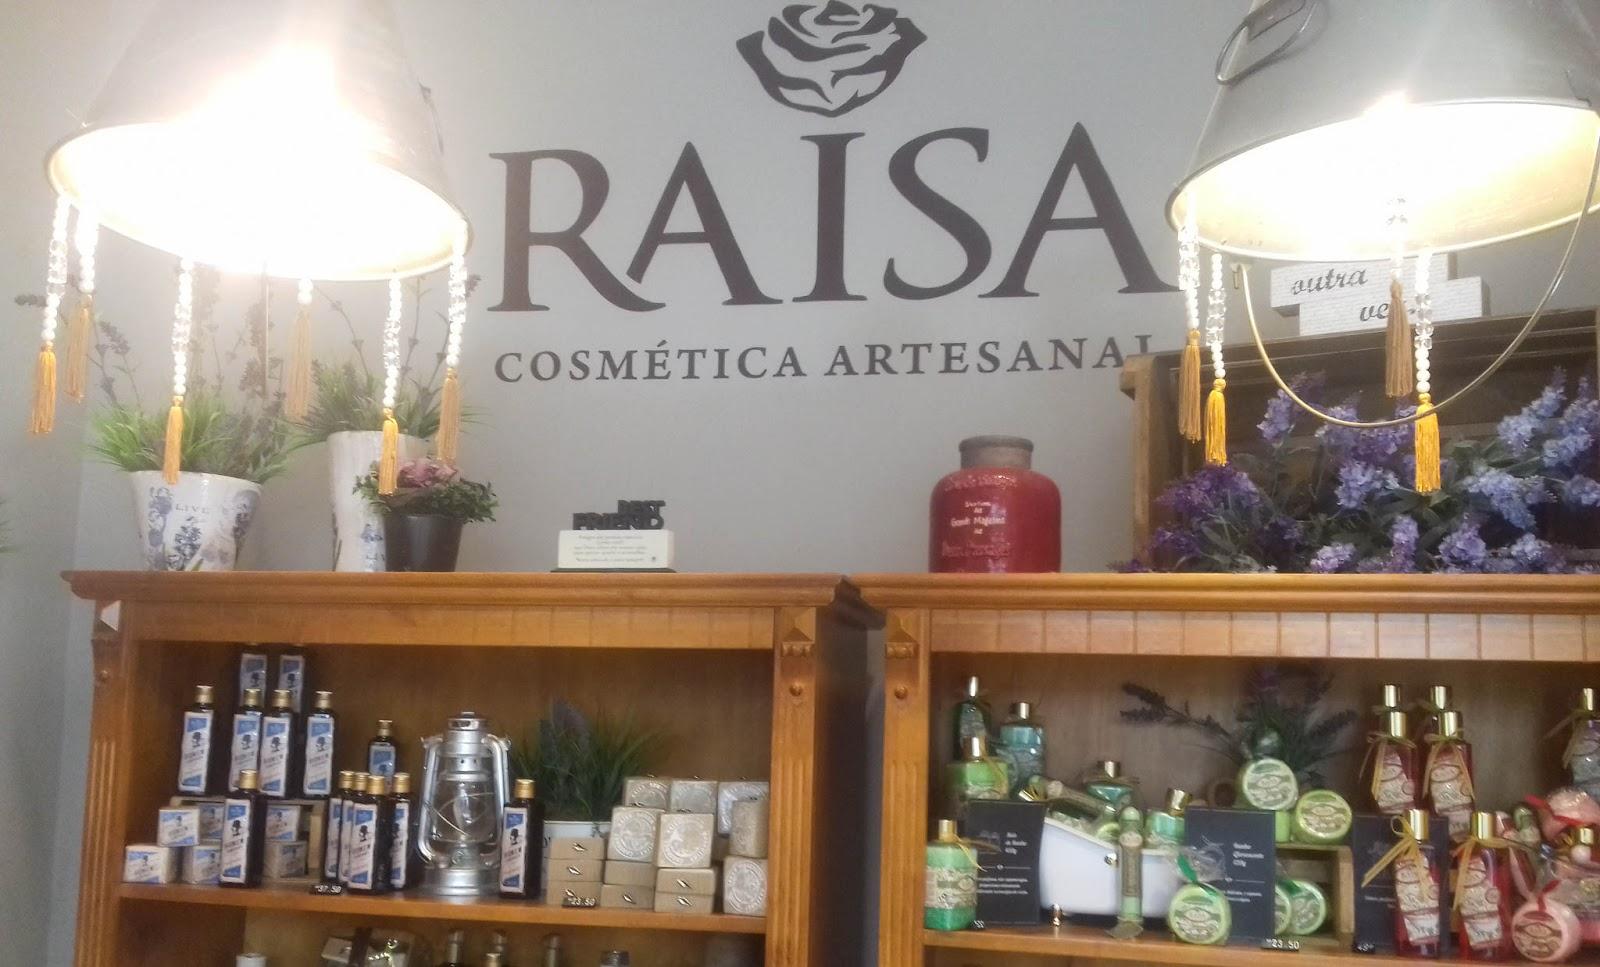 Well-known Loja Raisa Cosmética Artesanal | Blog Moda da Gente RQ56